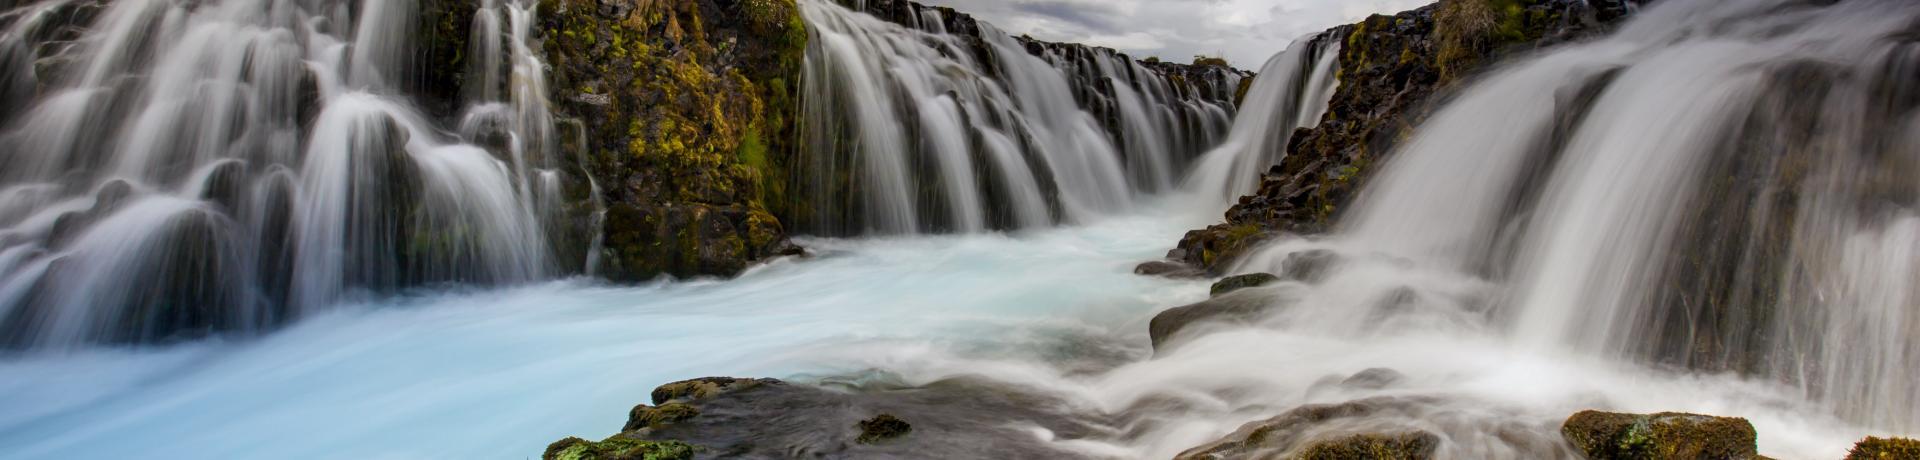 6013+Island+Reykjavik+Wasserfälle_Reykjavik+TS_168797085.jpg